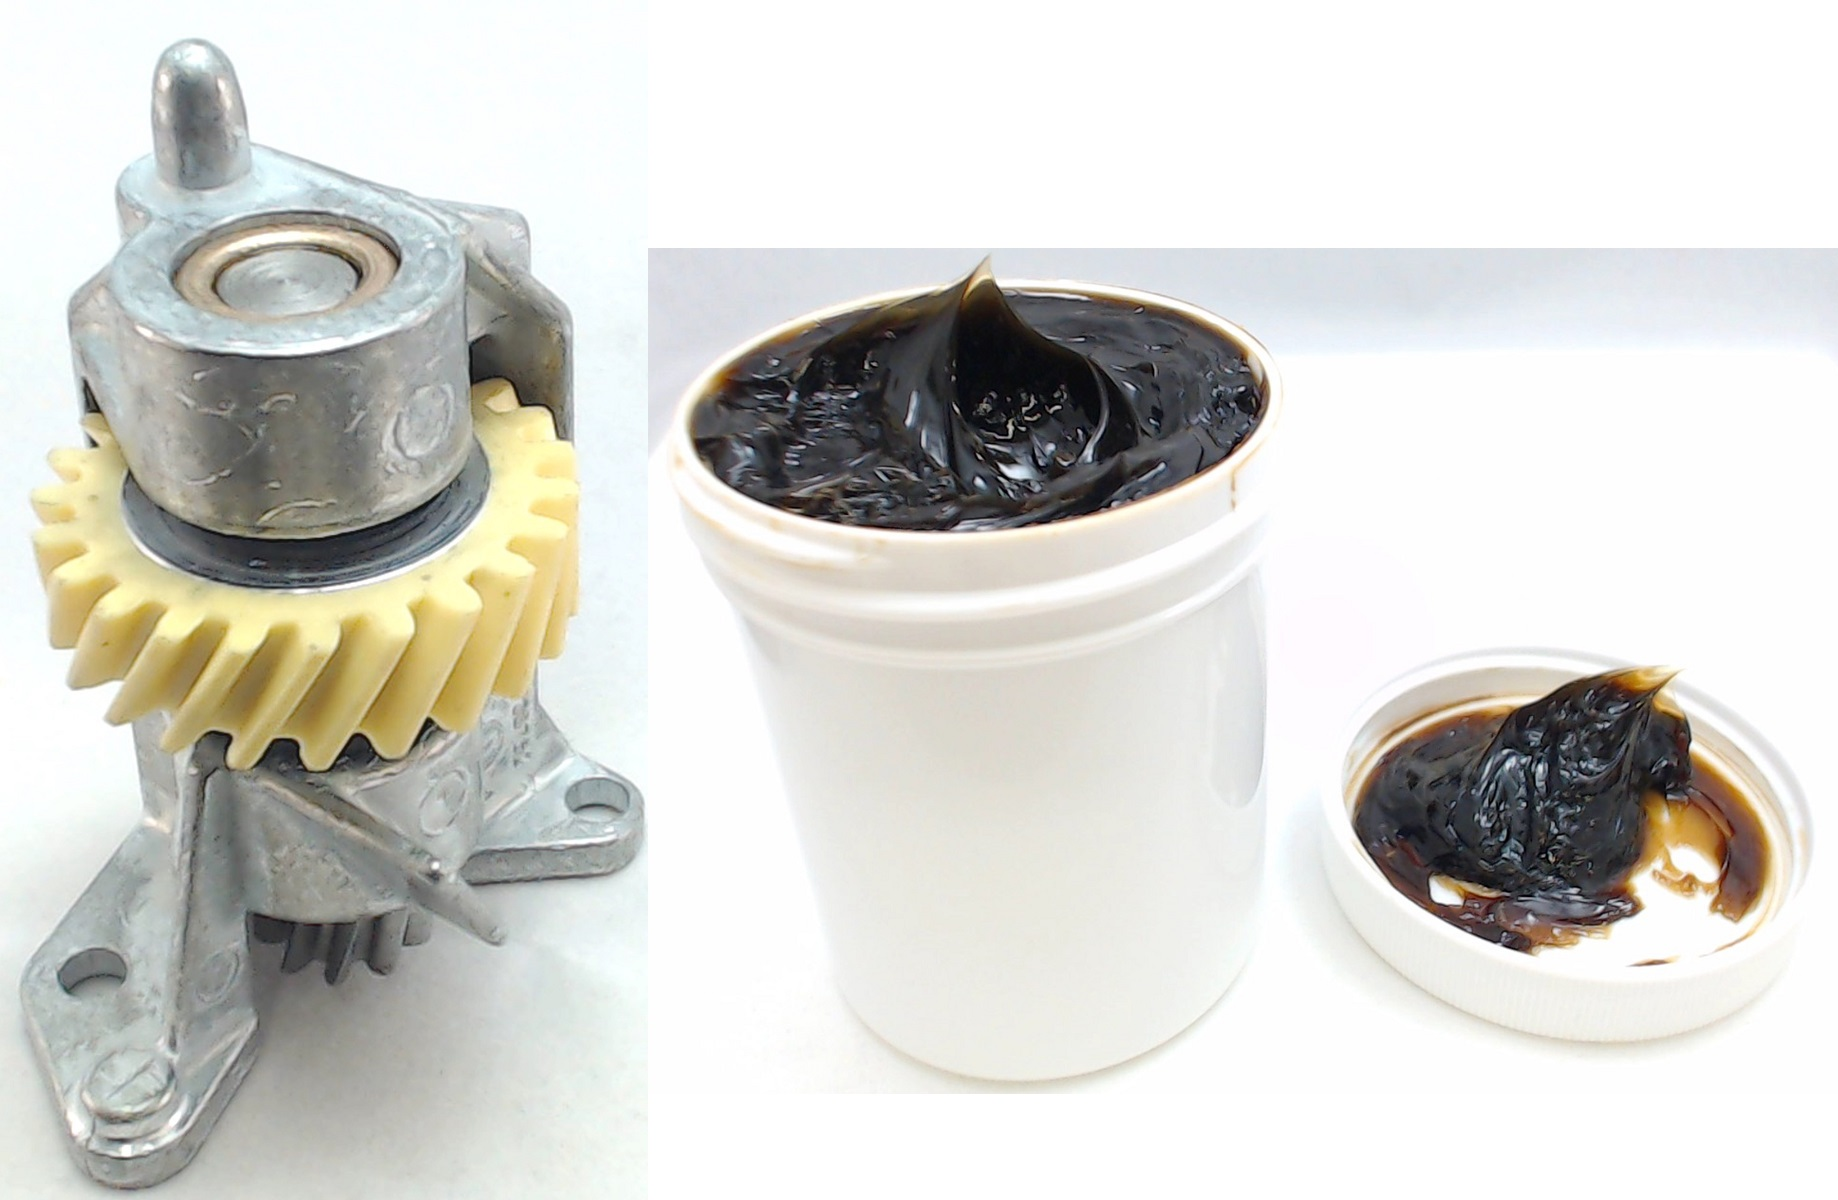 Kitchenaid stand mixer gear assembly 240309 2 3 oz food grade grease ebay - Food grade grease kitchenaid ...